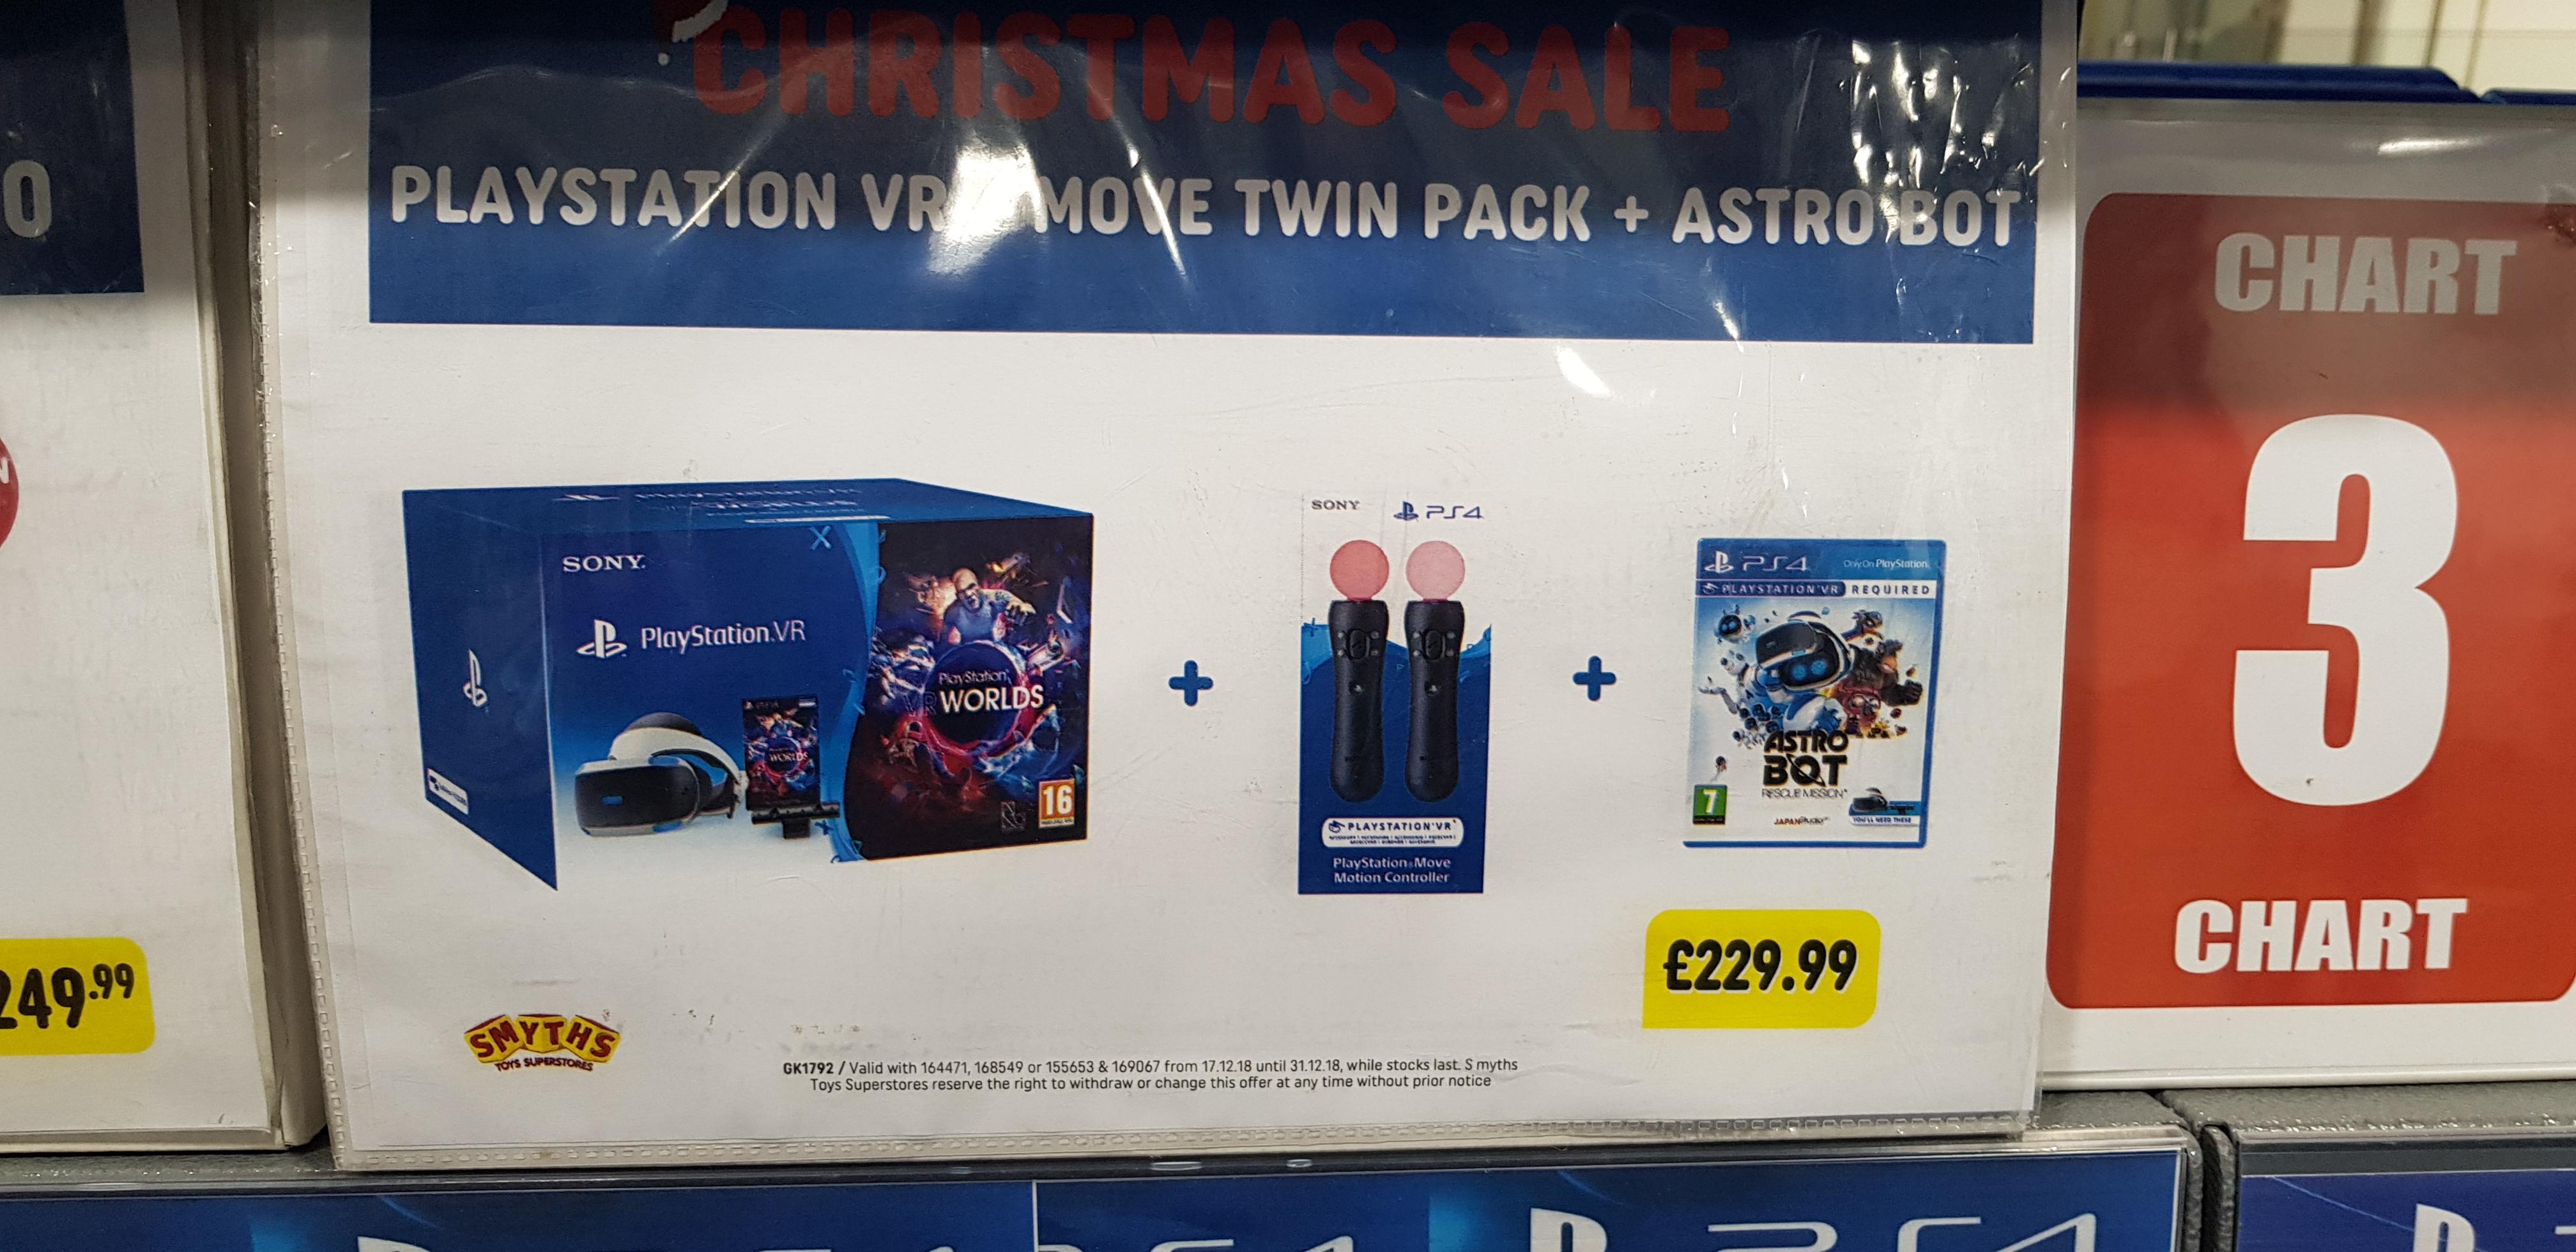 Playstation VR worlds starter pack + move controller twin pack + Astrobot - £229.99 @ Smyths (Glasgow)